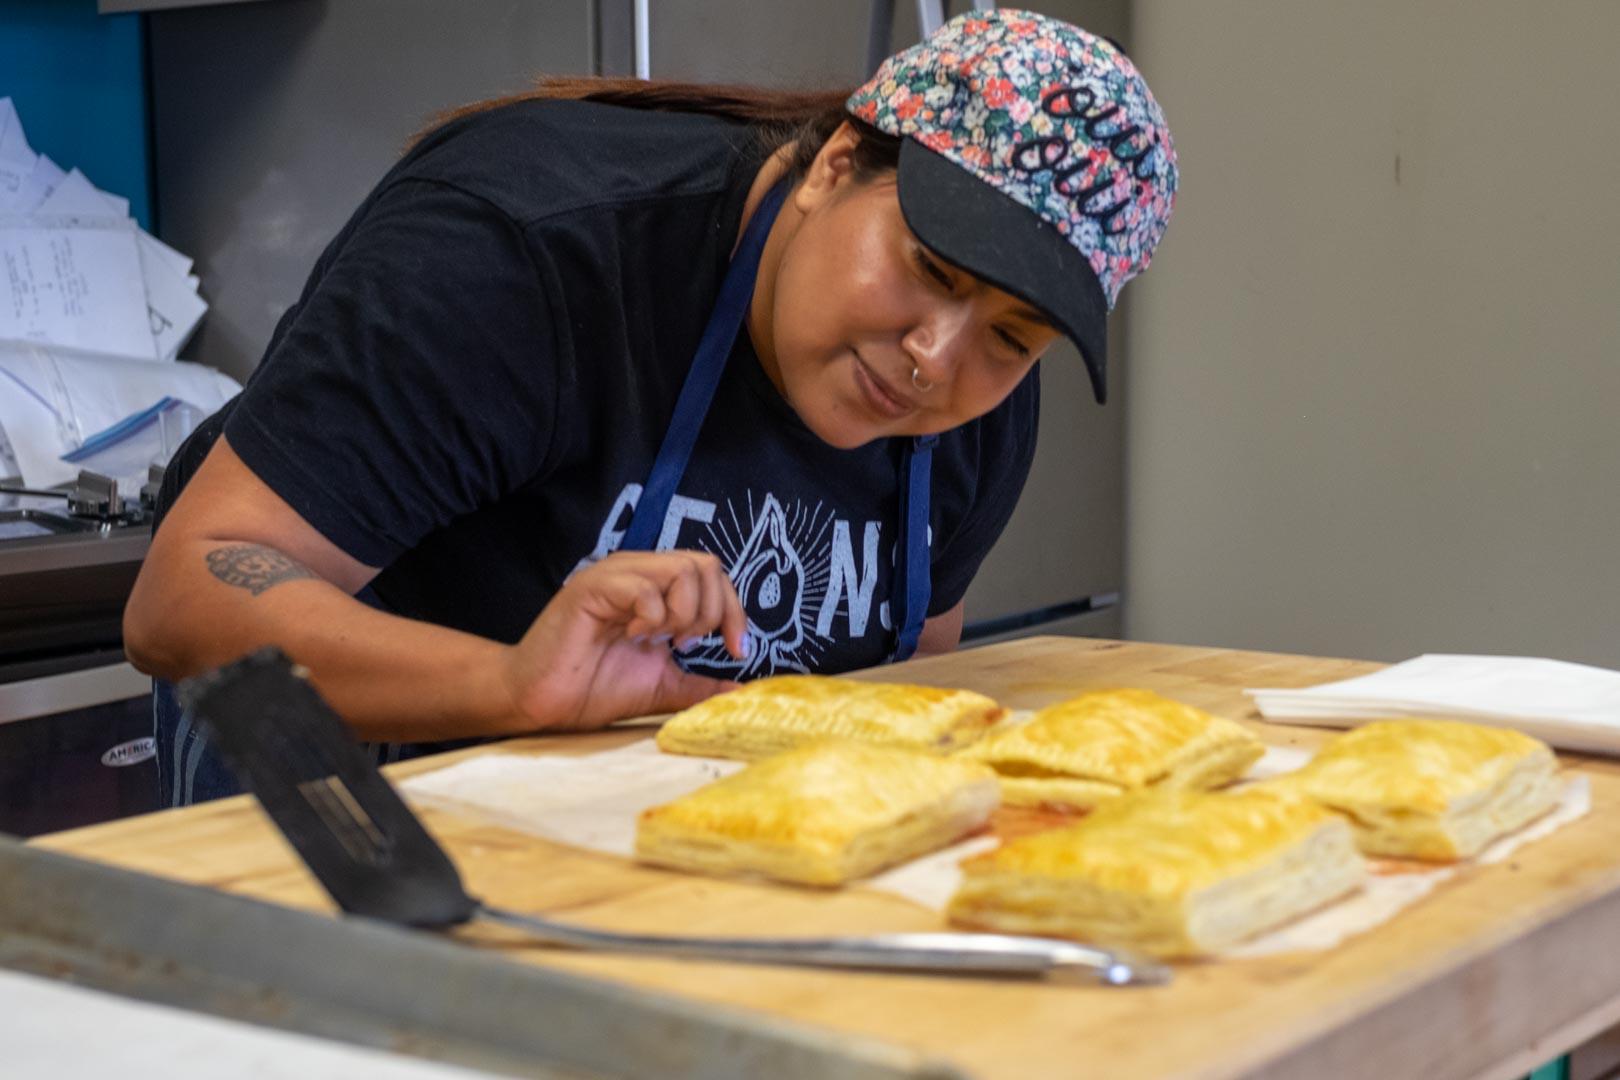 monarch-school-cooking-class-pop-tart-class-dominique-cancio